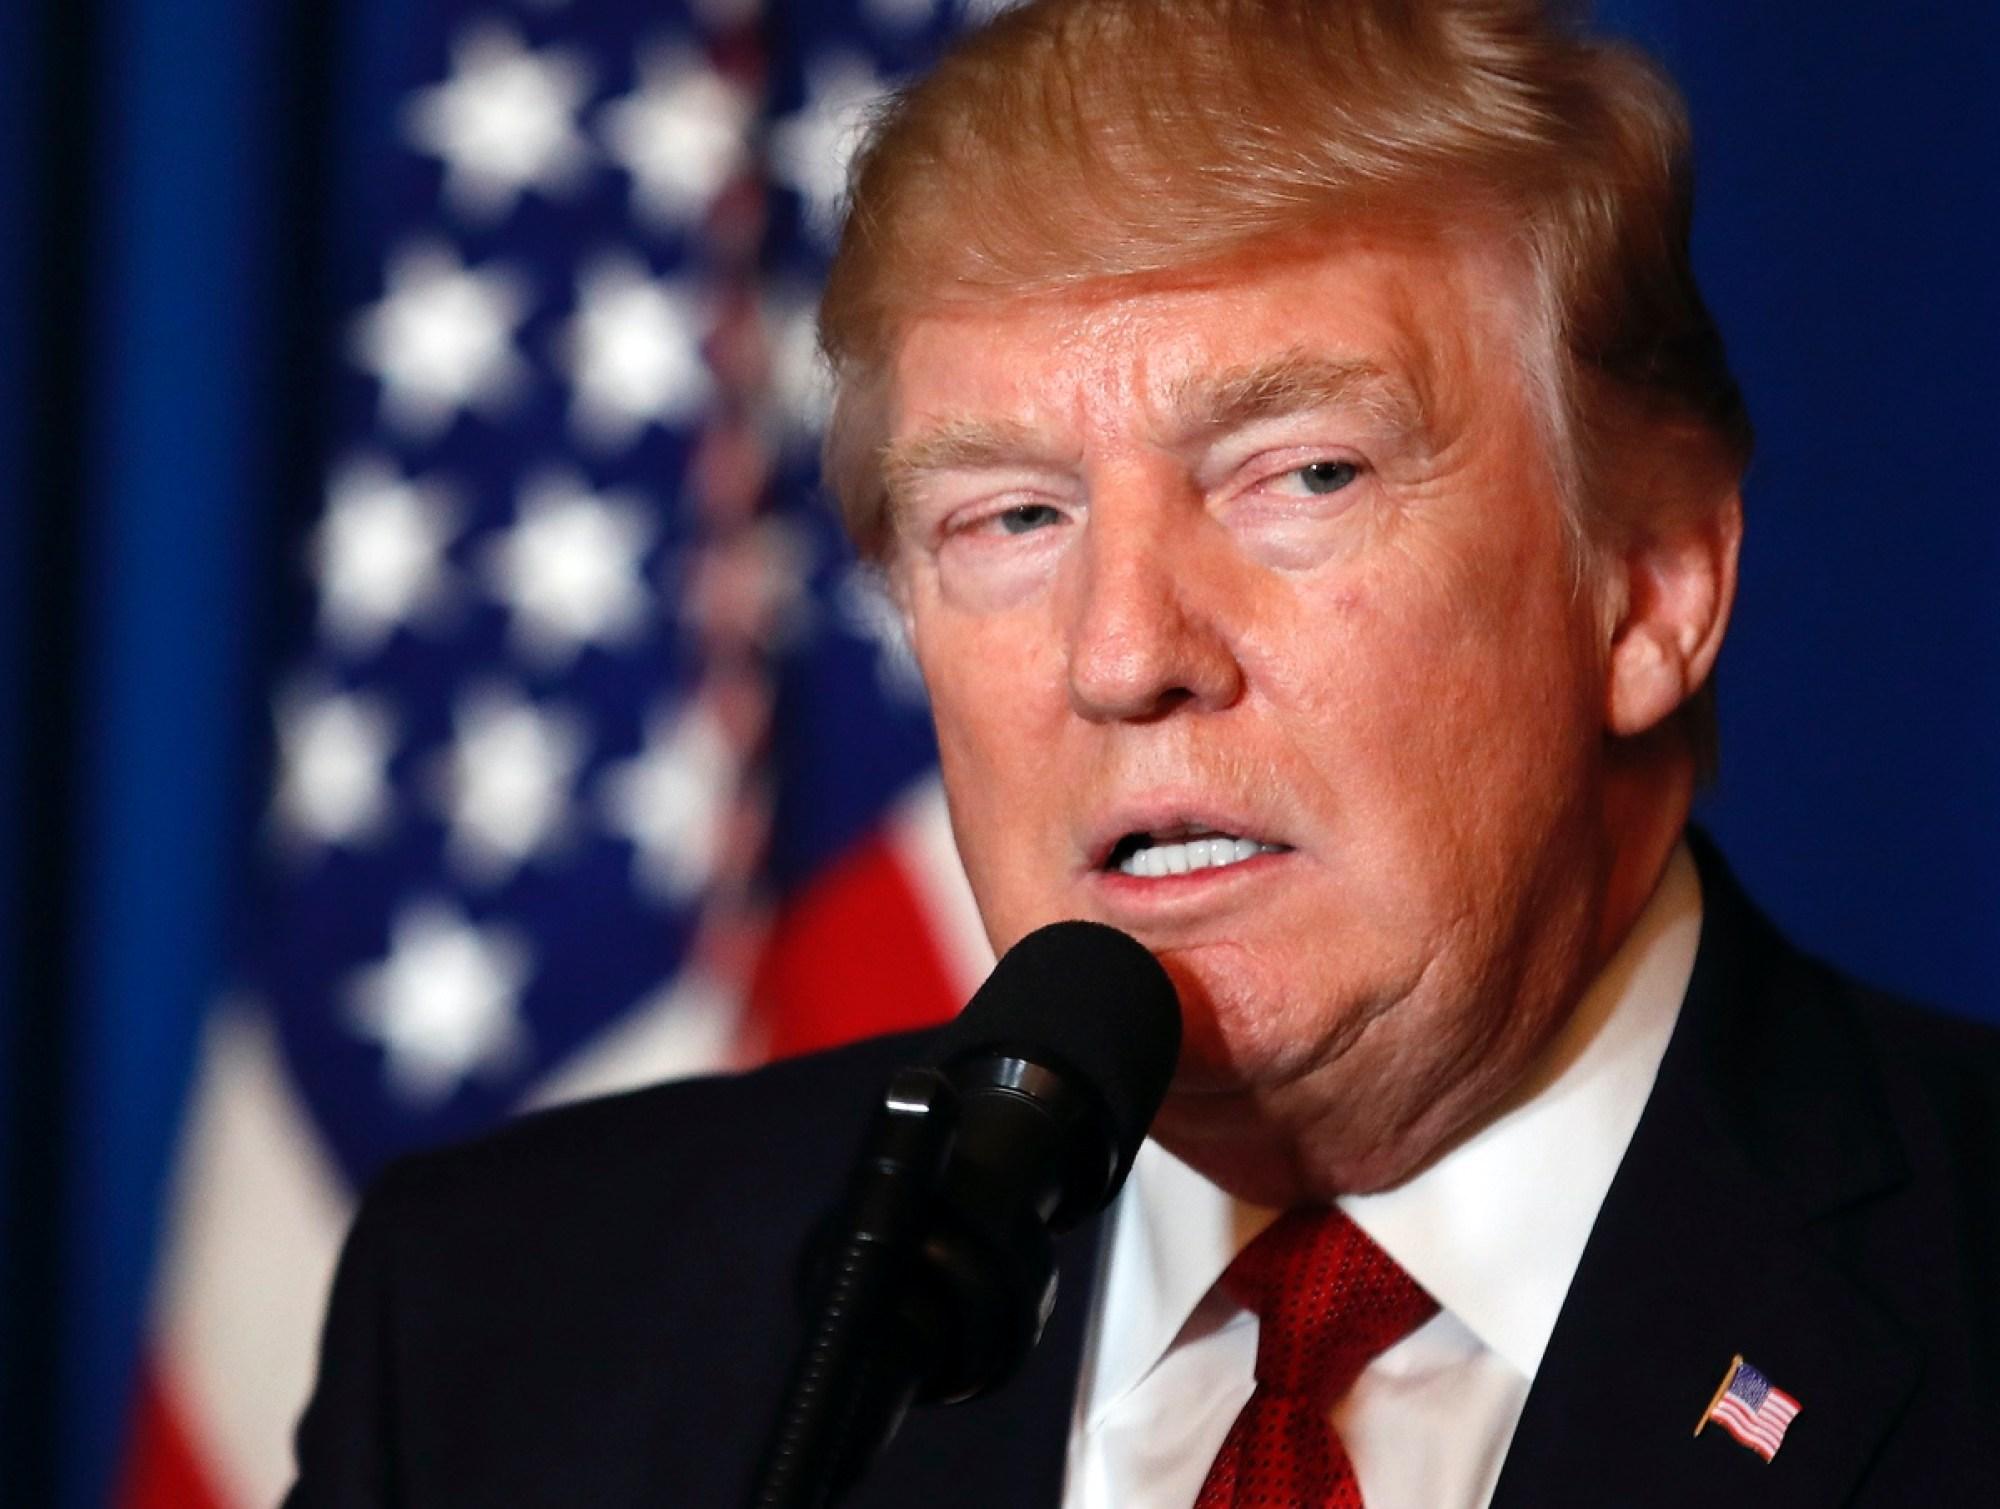 President Donald Trump speaks at Mar-a-Lago, Thursday, April 6, 2017, in Palm Beach, Fla. (AP Photo/AlexBrandon)